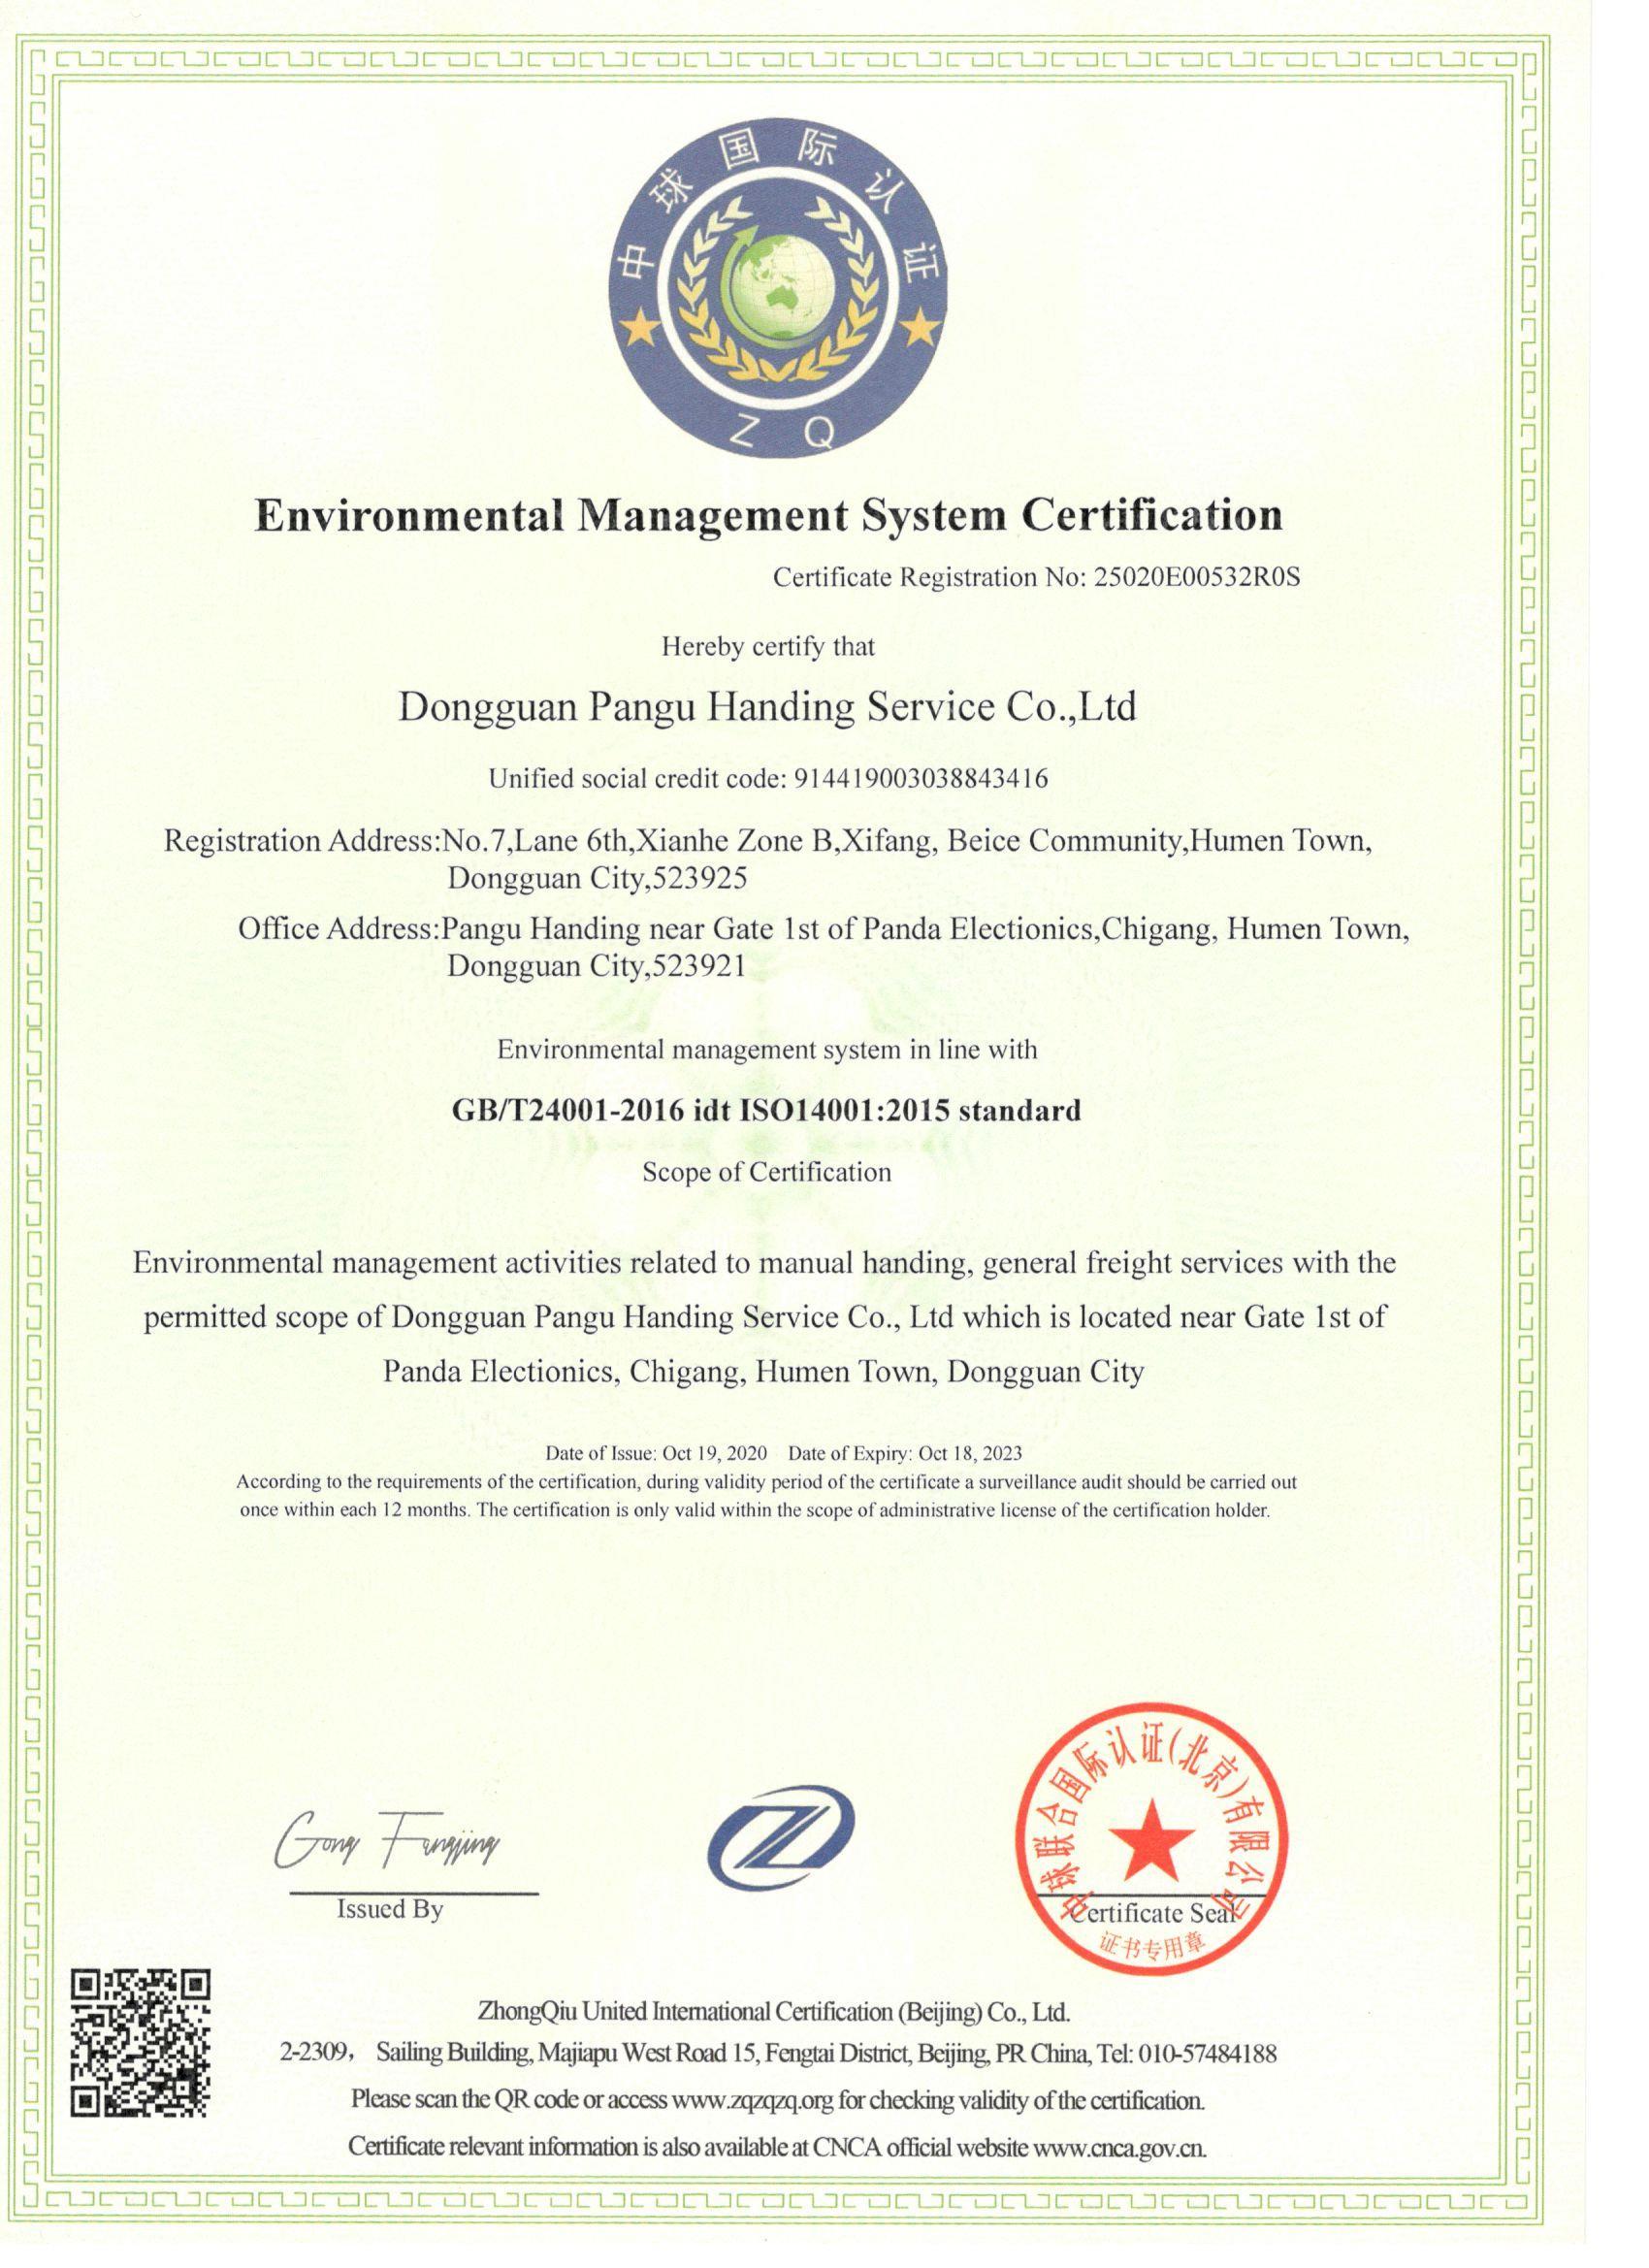 Environmental Management System Certification 认证-东莞市盘古搬运服务有限公司